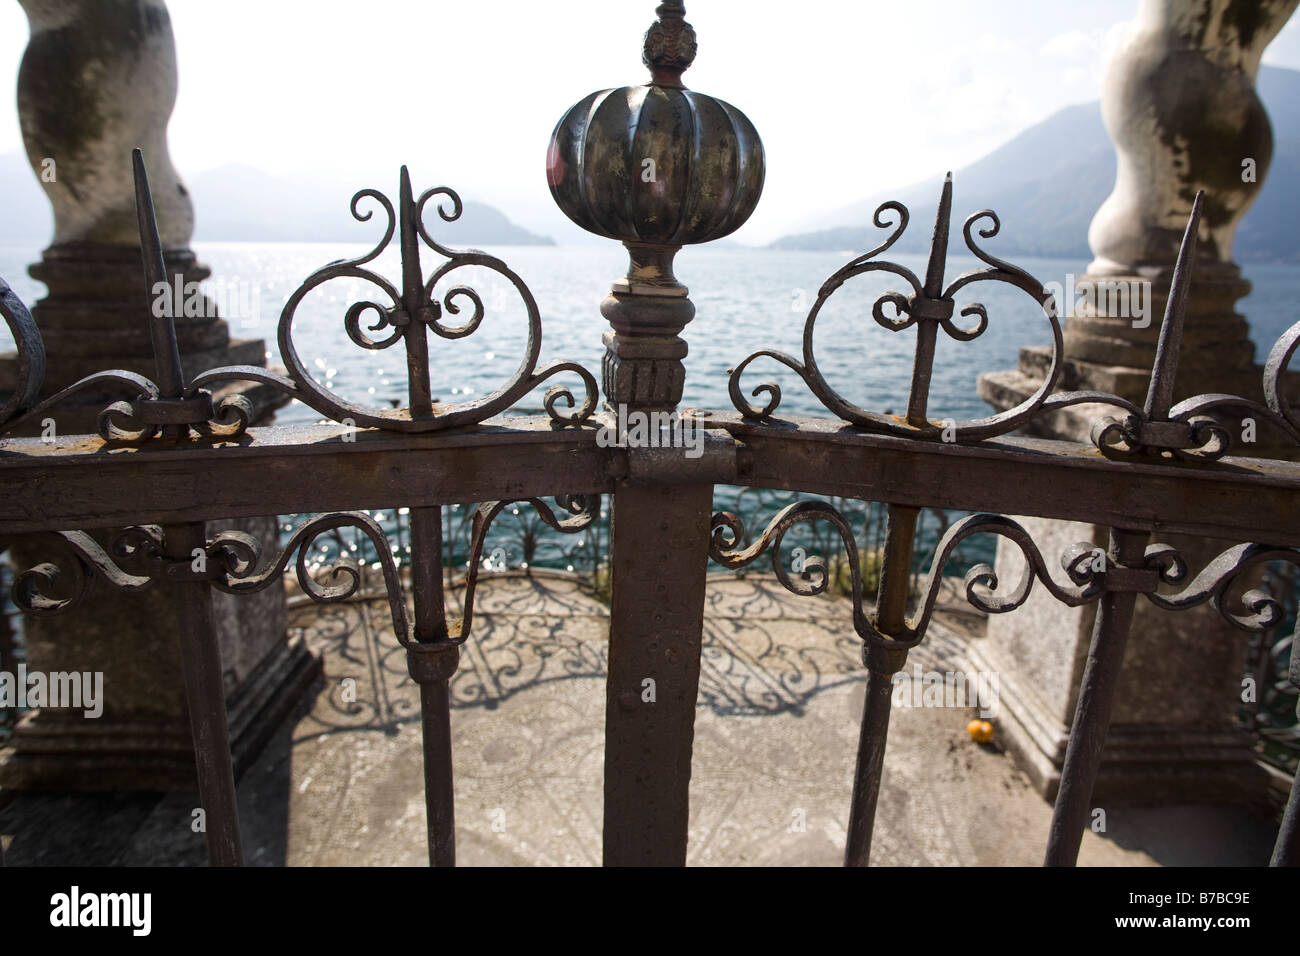 Hand-made old aristocratic waterfront gate. Varenna, Villa Monastero, Lecco, Lake Como, Italy - Stock Image